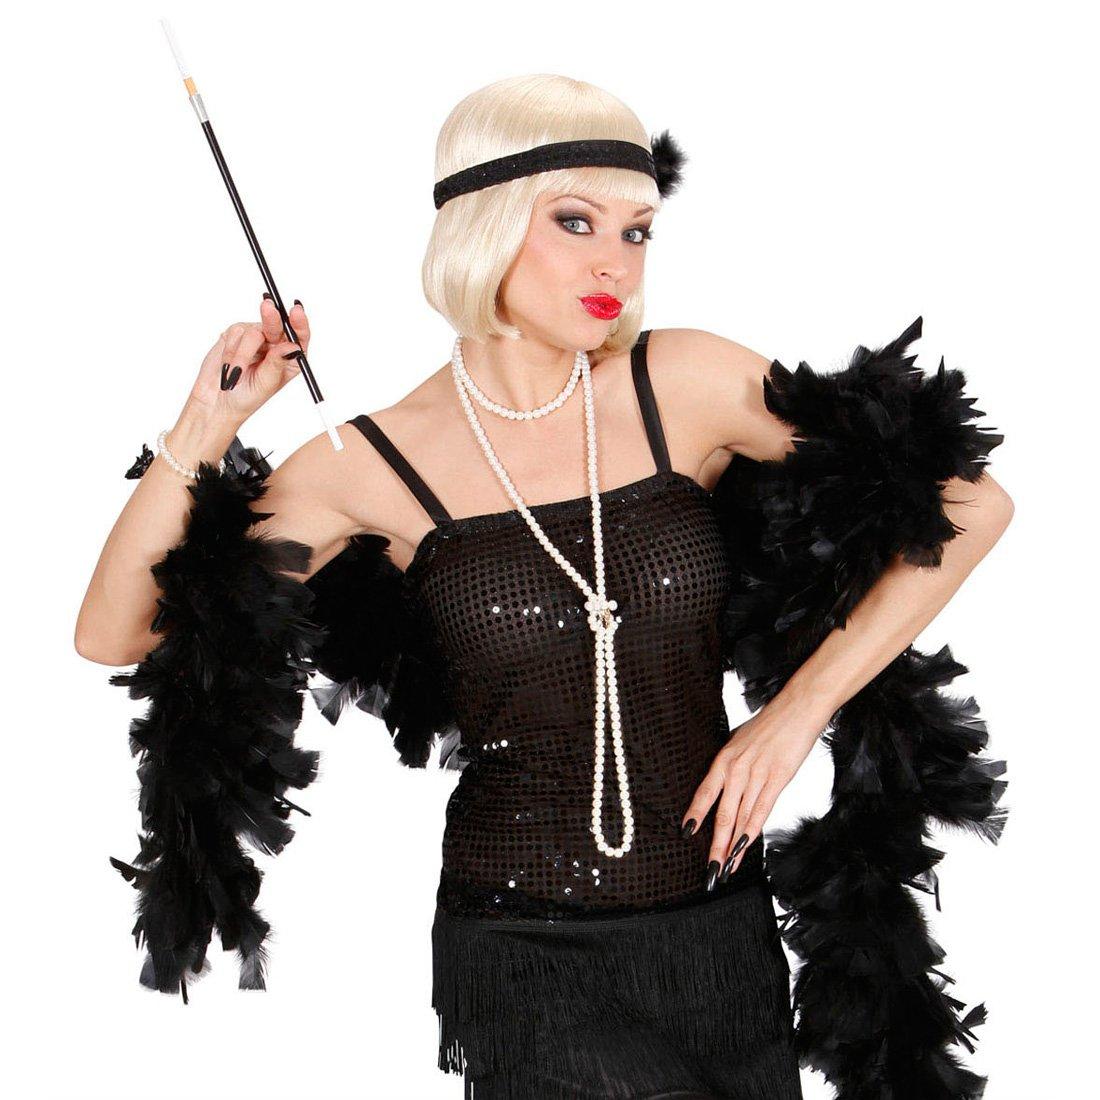 Boa de plumas Boa de plumas negro cortina Boa de plumas artículos de fiesta Charleston 20er accesorios Carnaval años NET TOYS